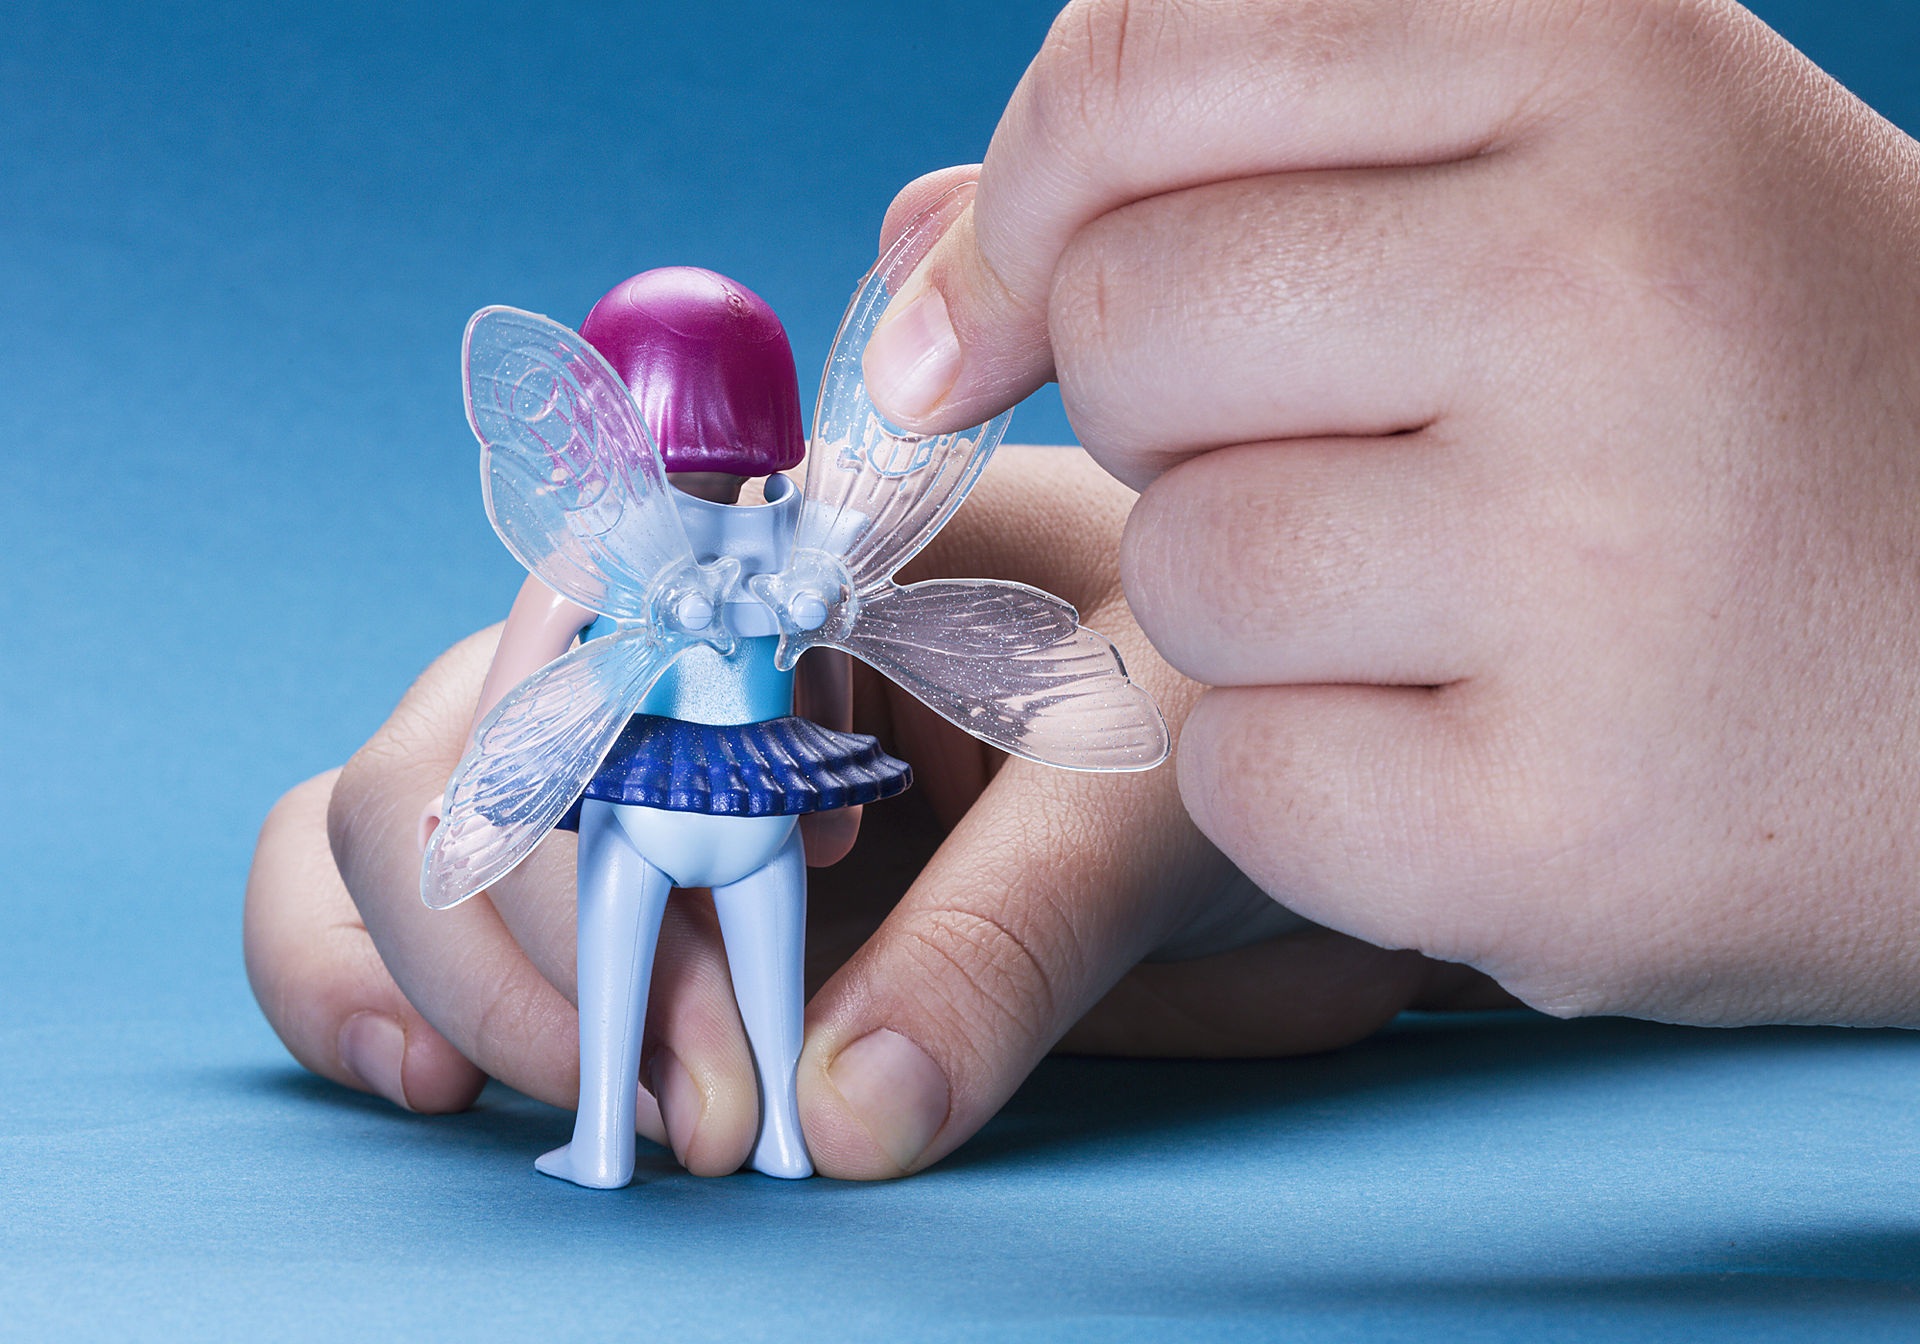 70529 Fairy Unicorn Carry Case zoom image4